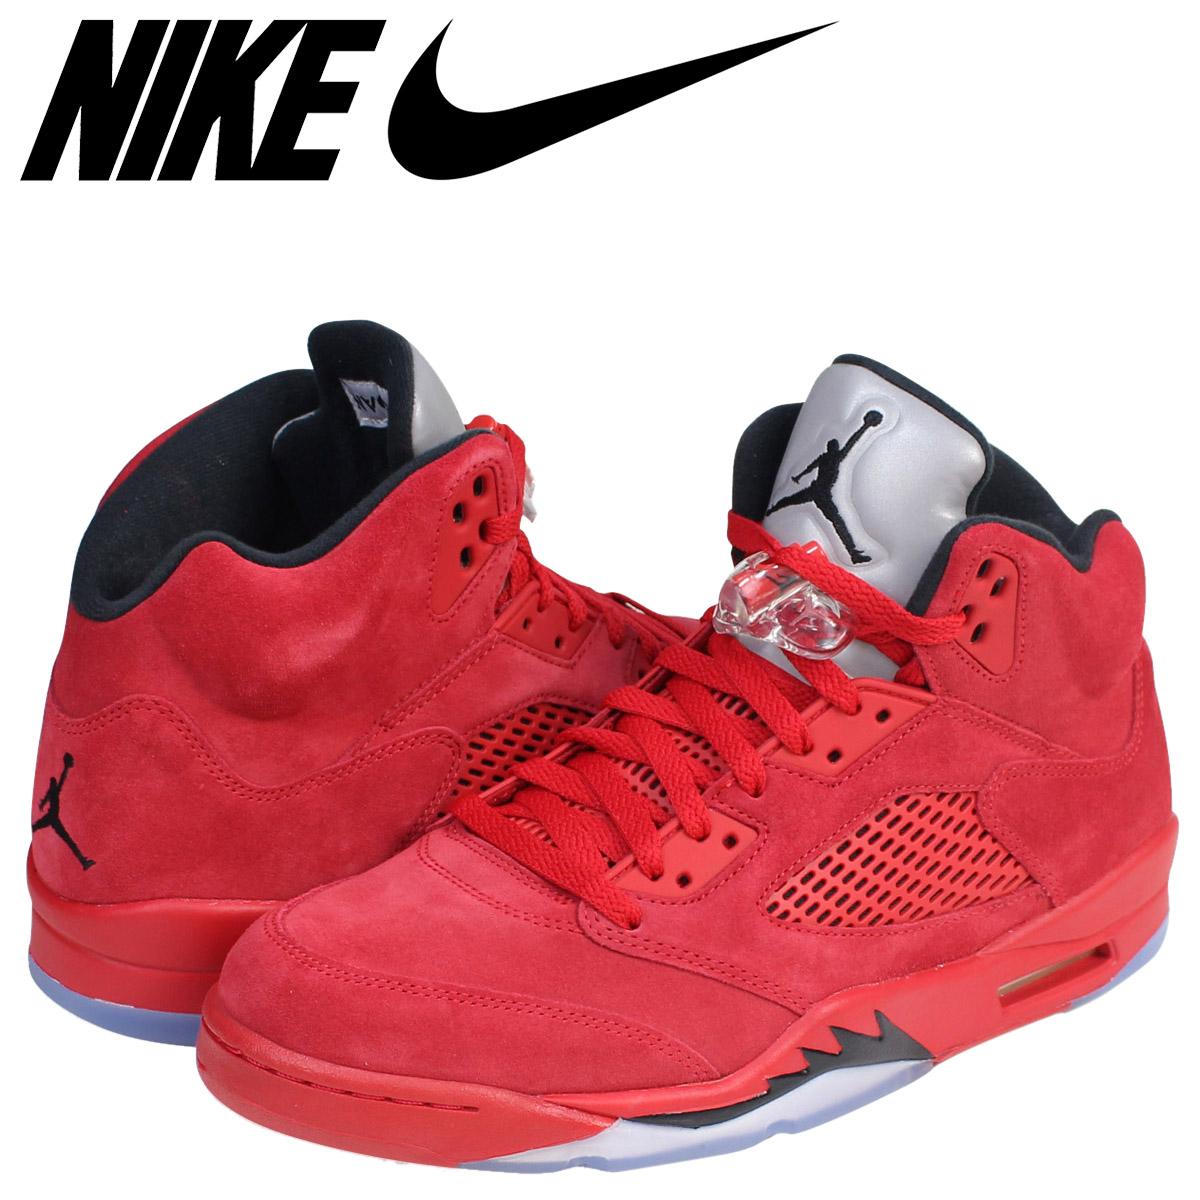 9dd493eb0ed ALLSPORTS  NIKE Nike Air Jordan 5 nostalgic sneakers AIR JORDAN 5 ...